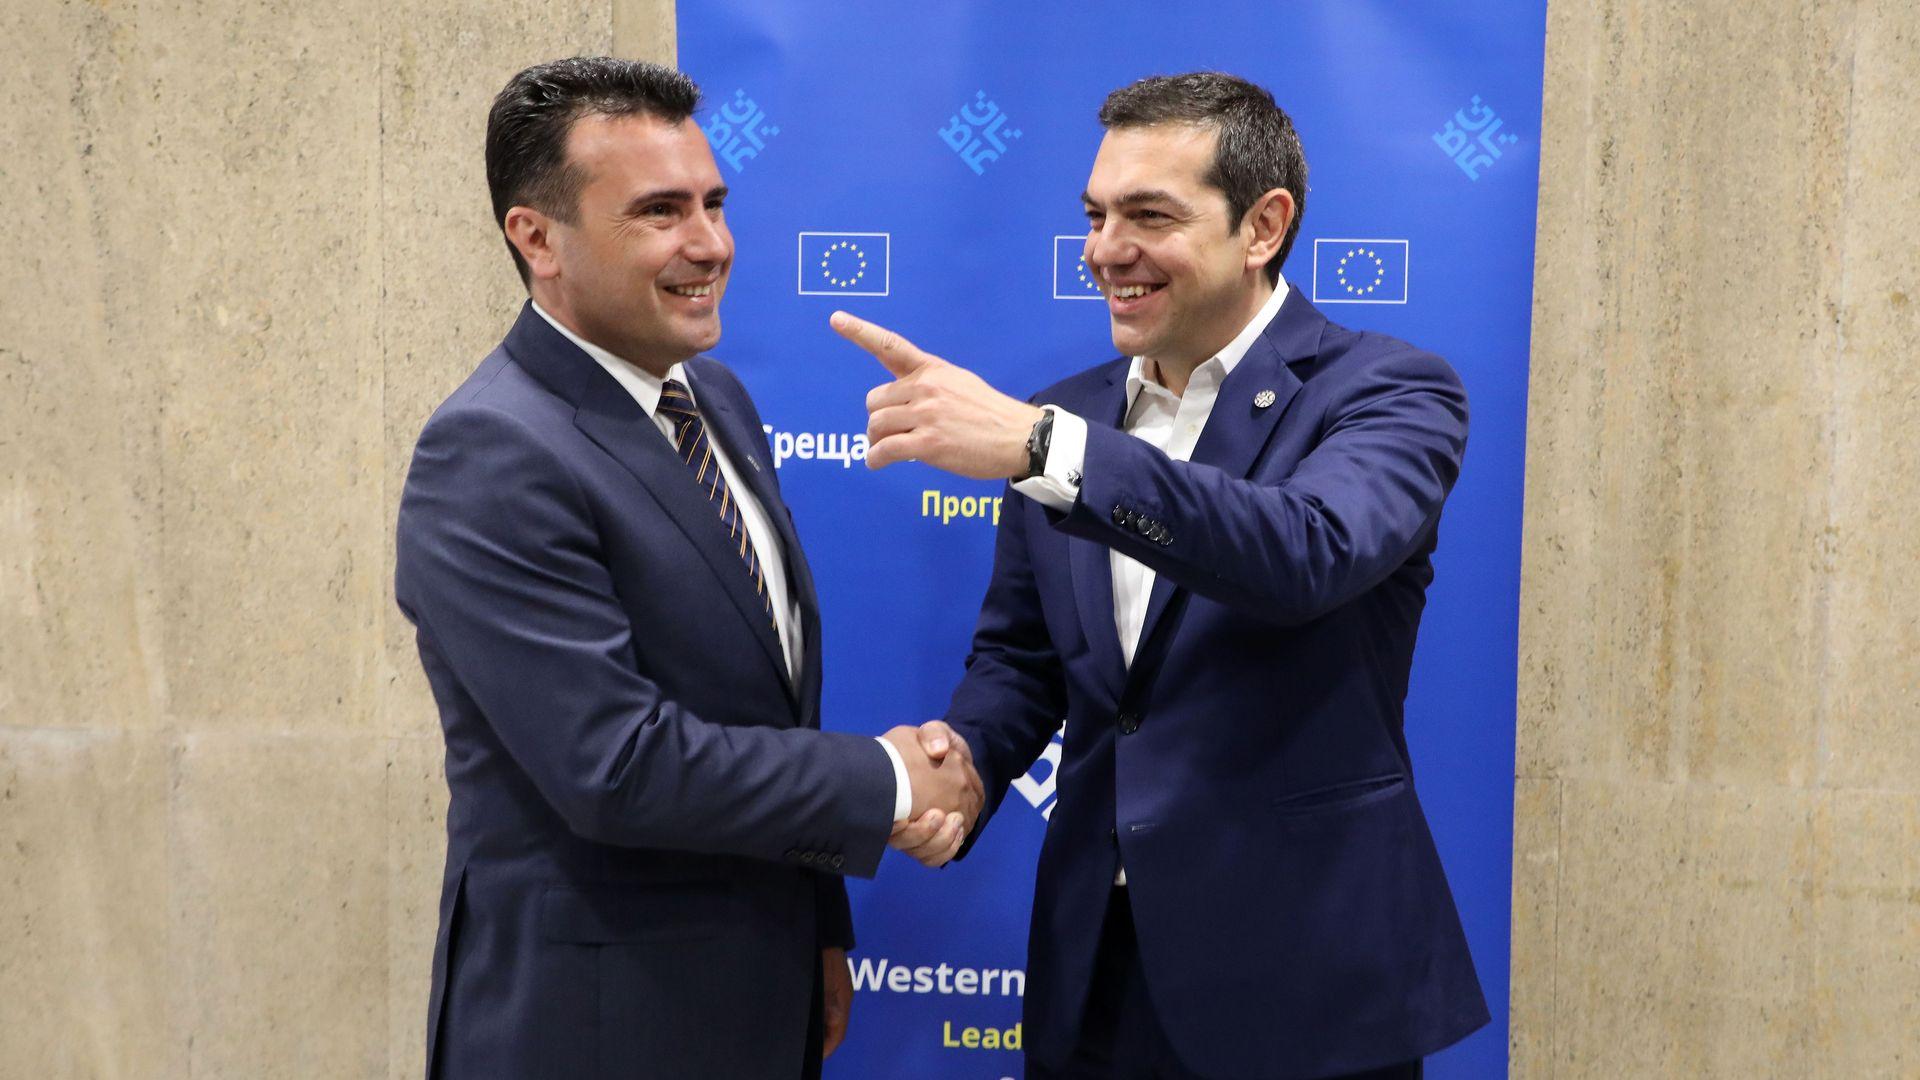 Greece's Prime minister Alexis Tsipras (R) and Macedonia's Prime Minister Zoran Zaev